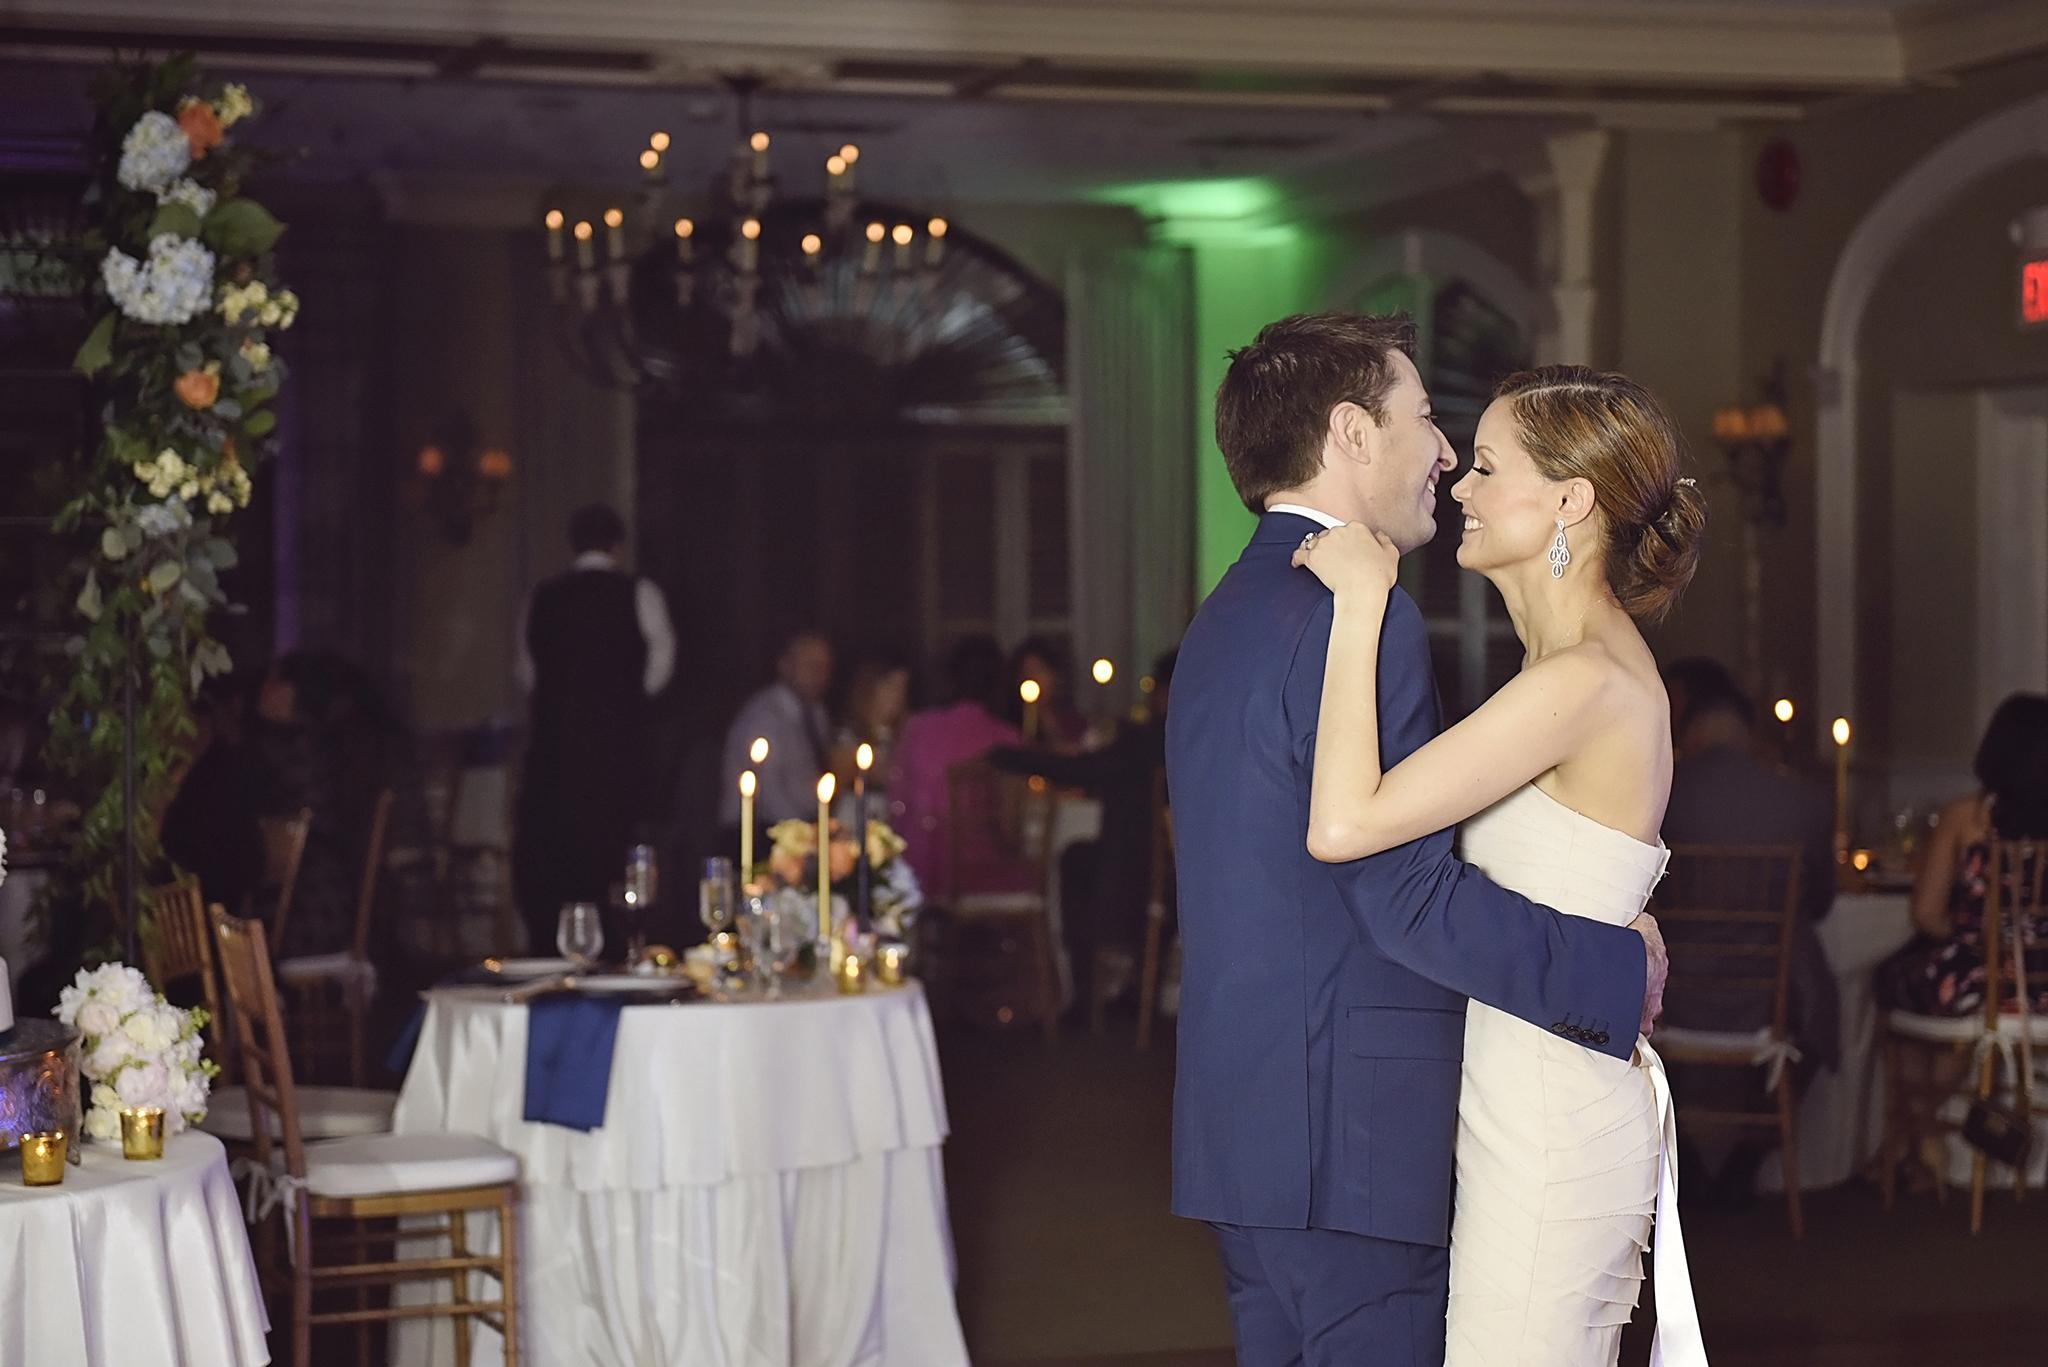 NJ-NY-wedding-photographer-148NJ-NY-wedding-photographer-148NJ-NY-WEDDING-PHOTOGRAPHER-148.JPG